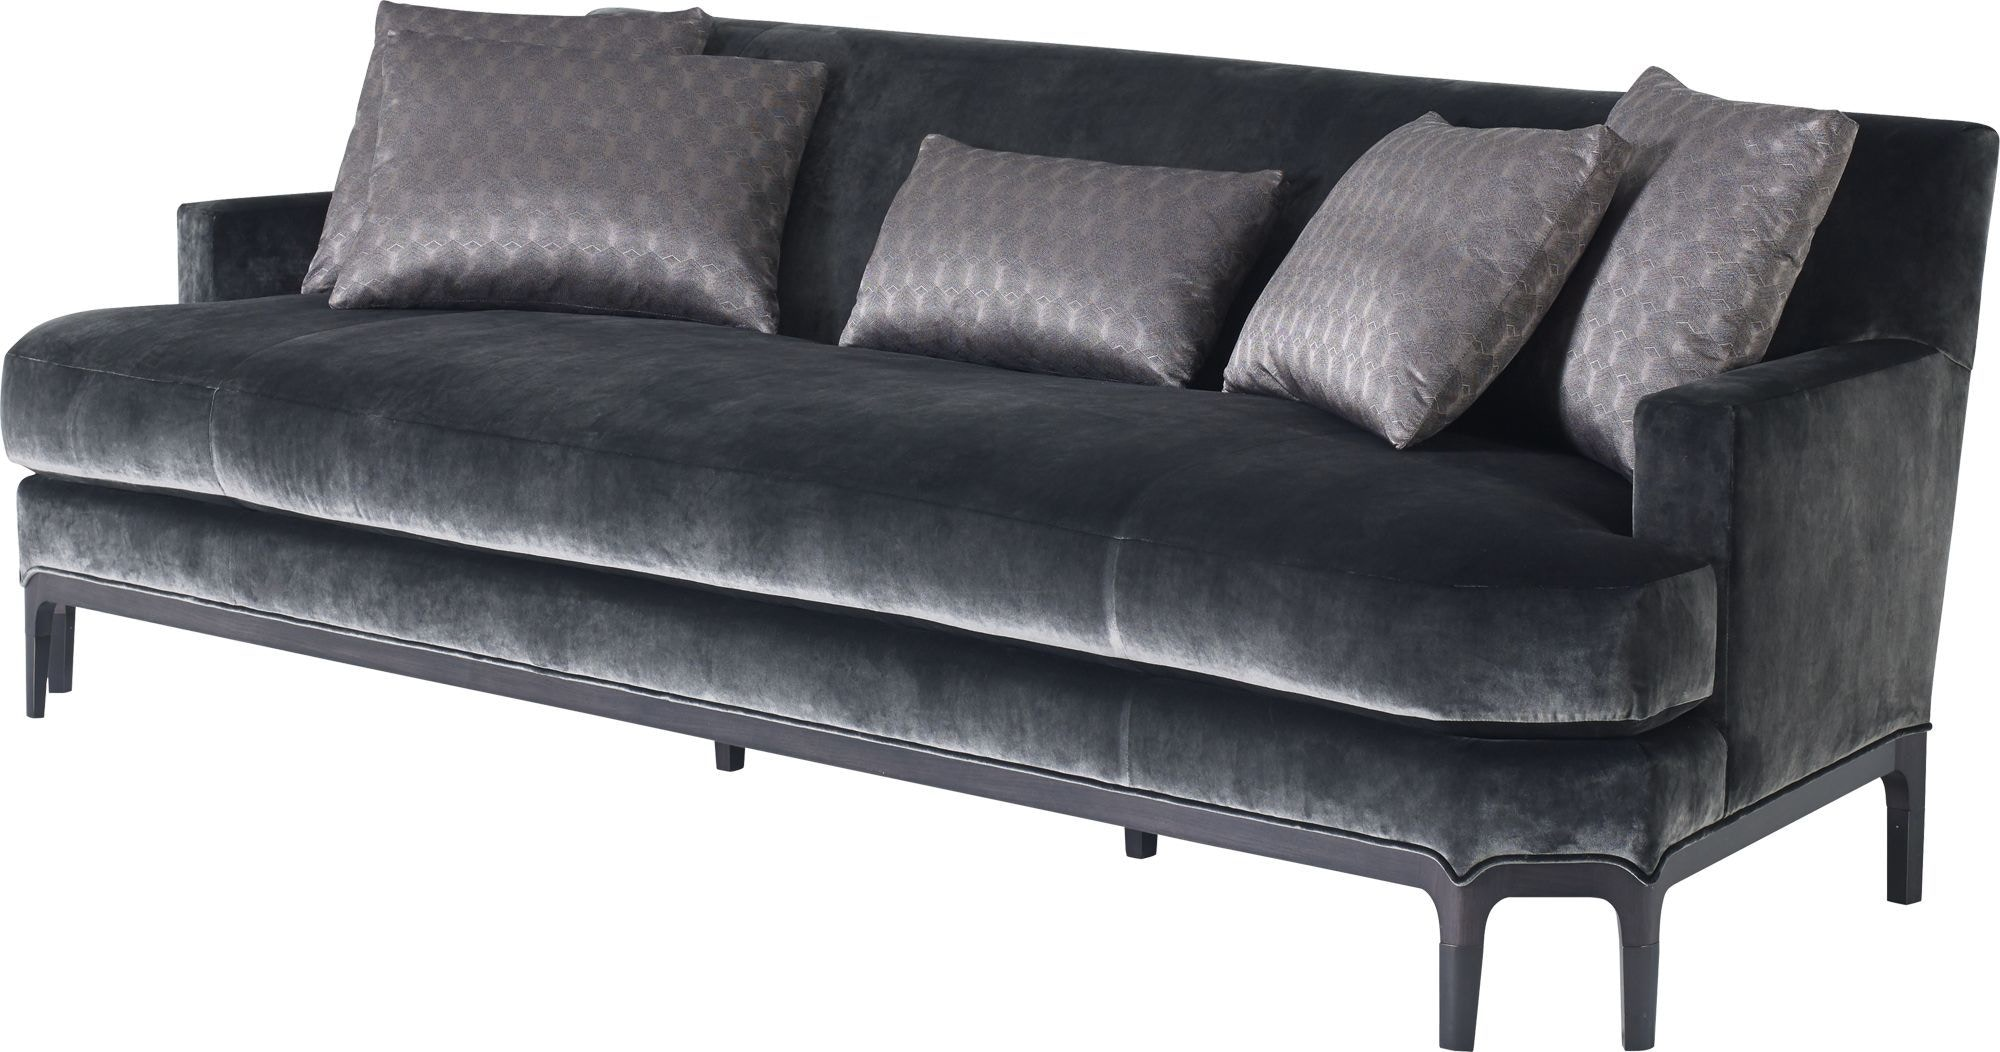 baker furniture max sofa palliser leather colors living room celestite 6179s hickory